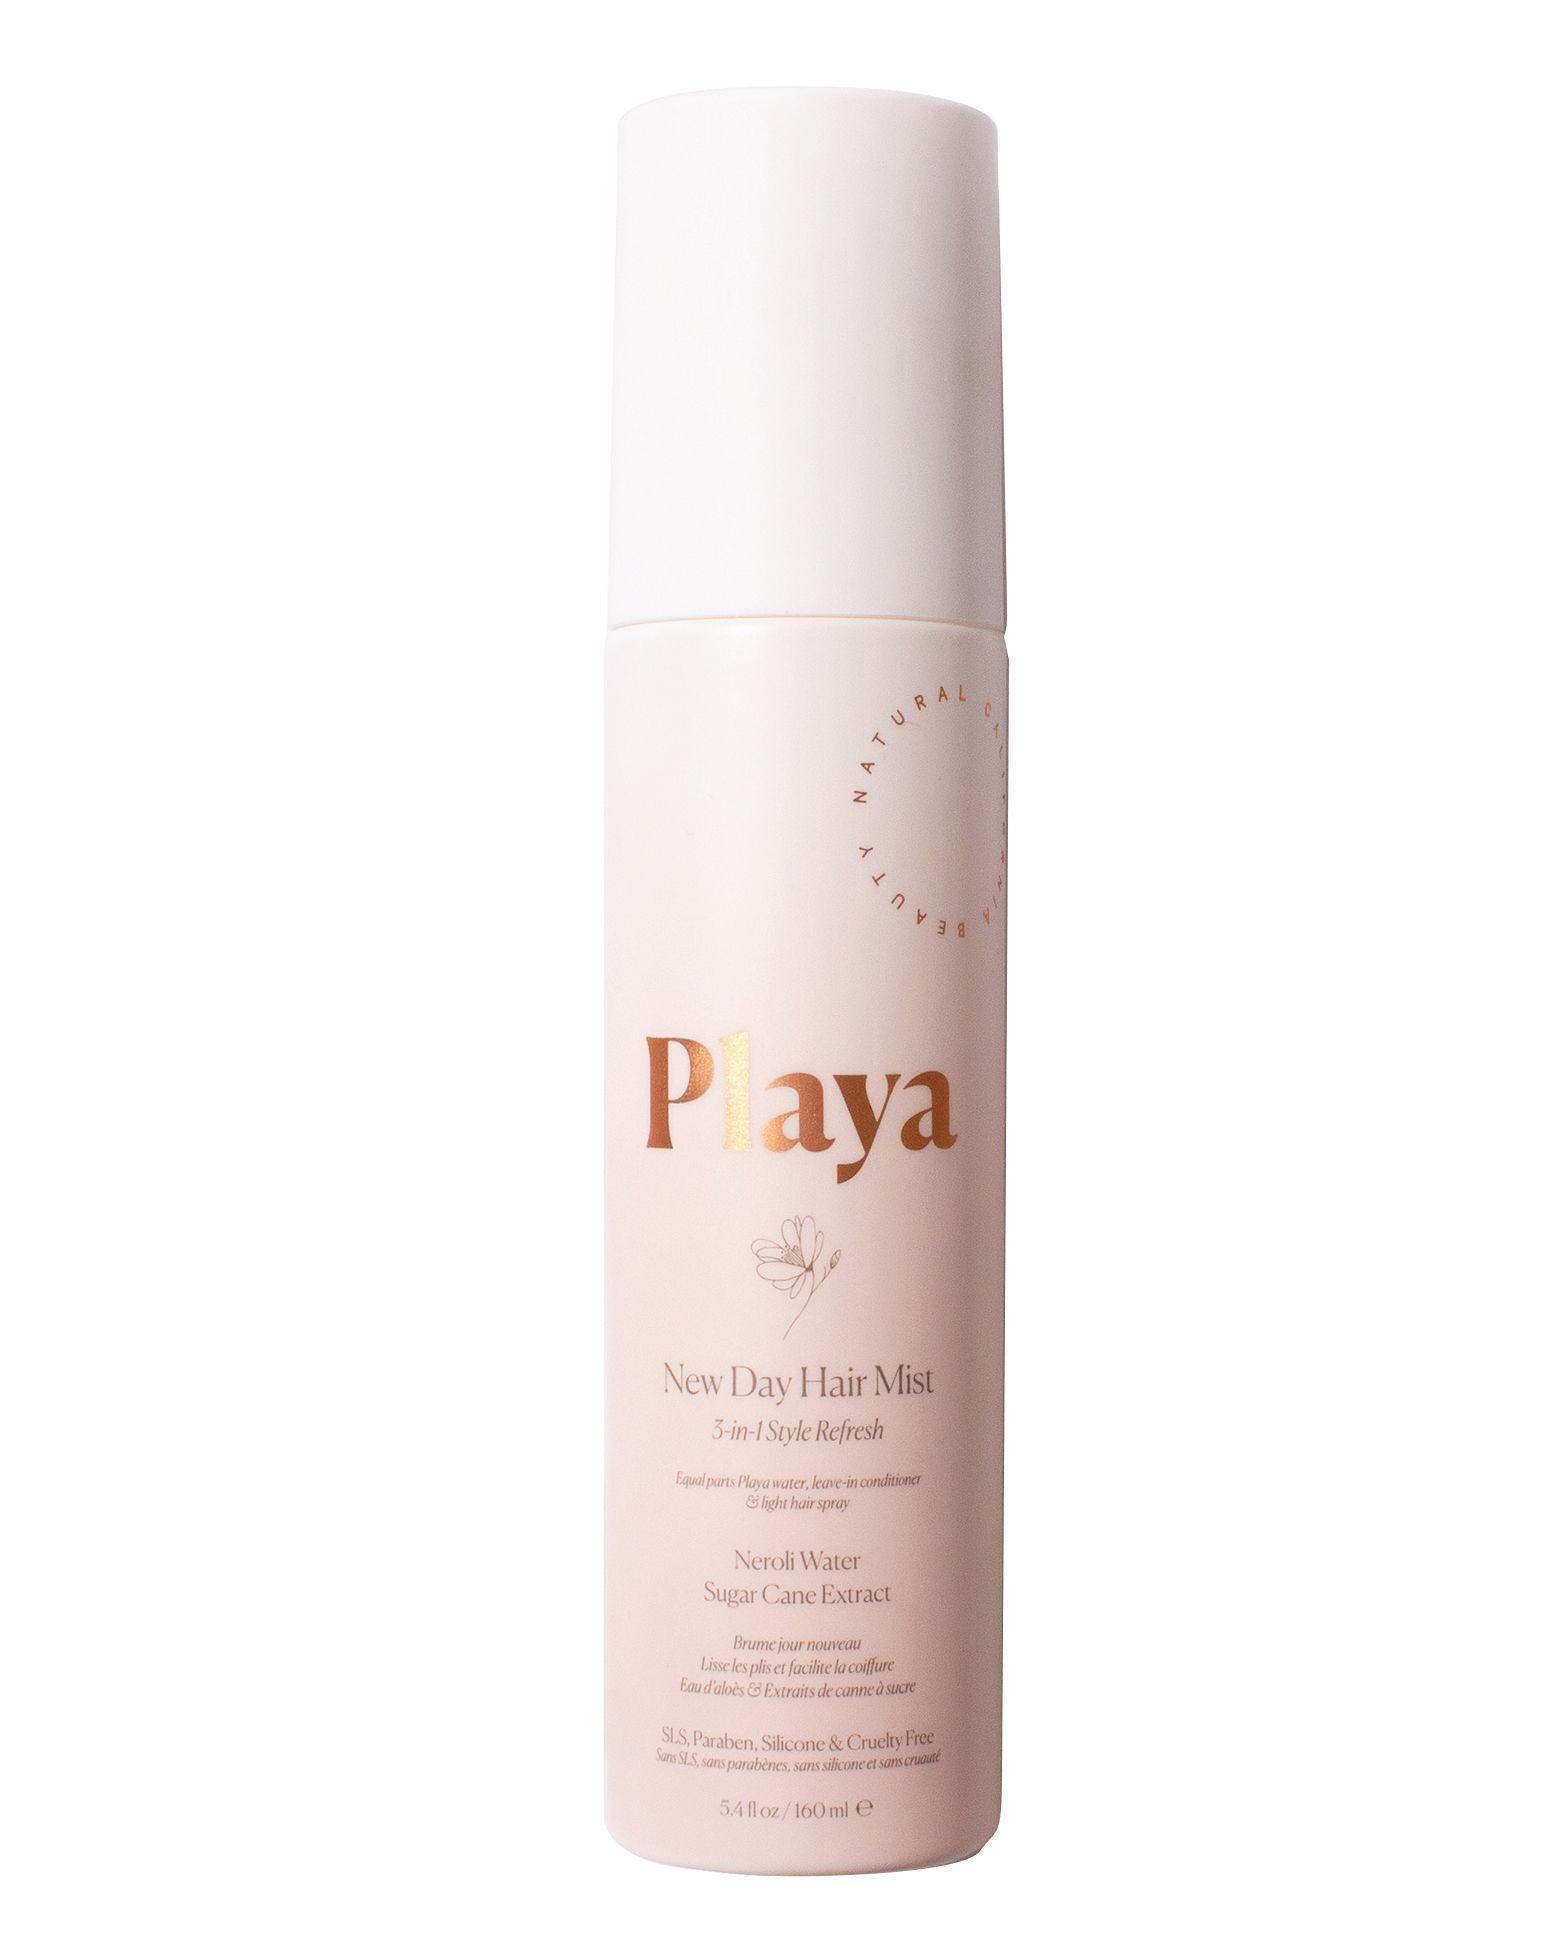 Playa New Day Hair Mist